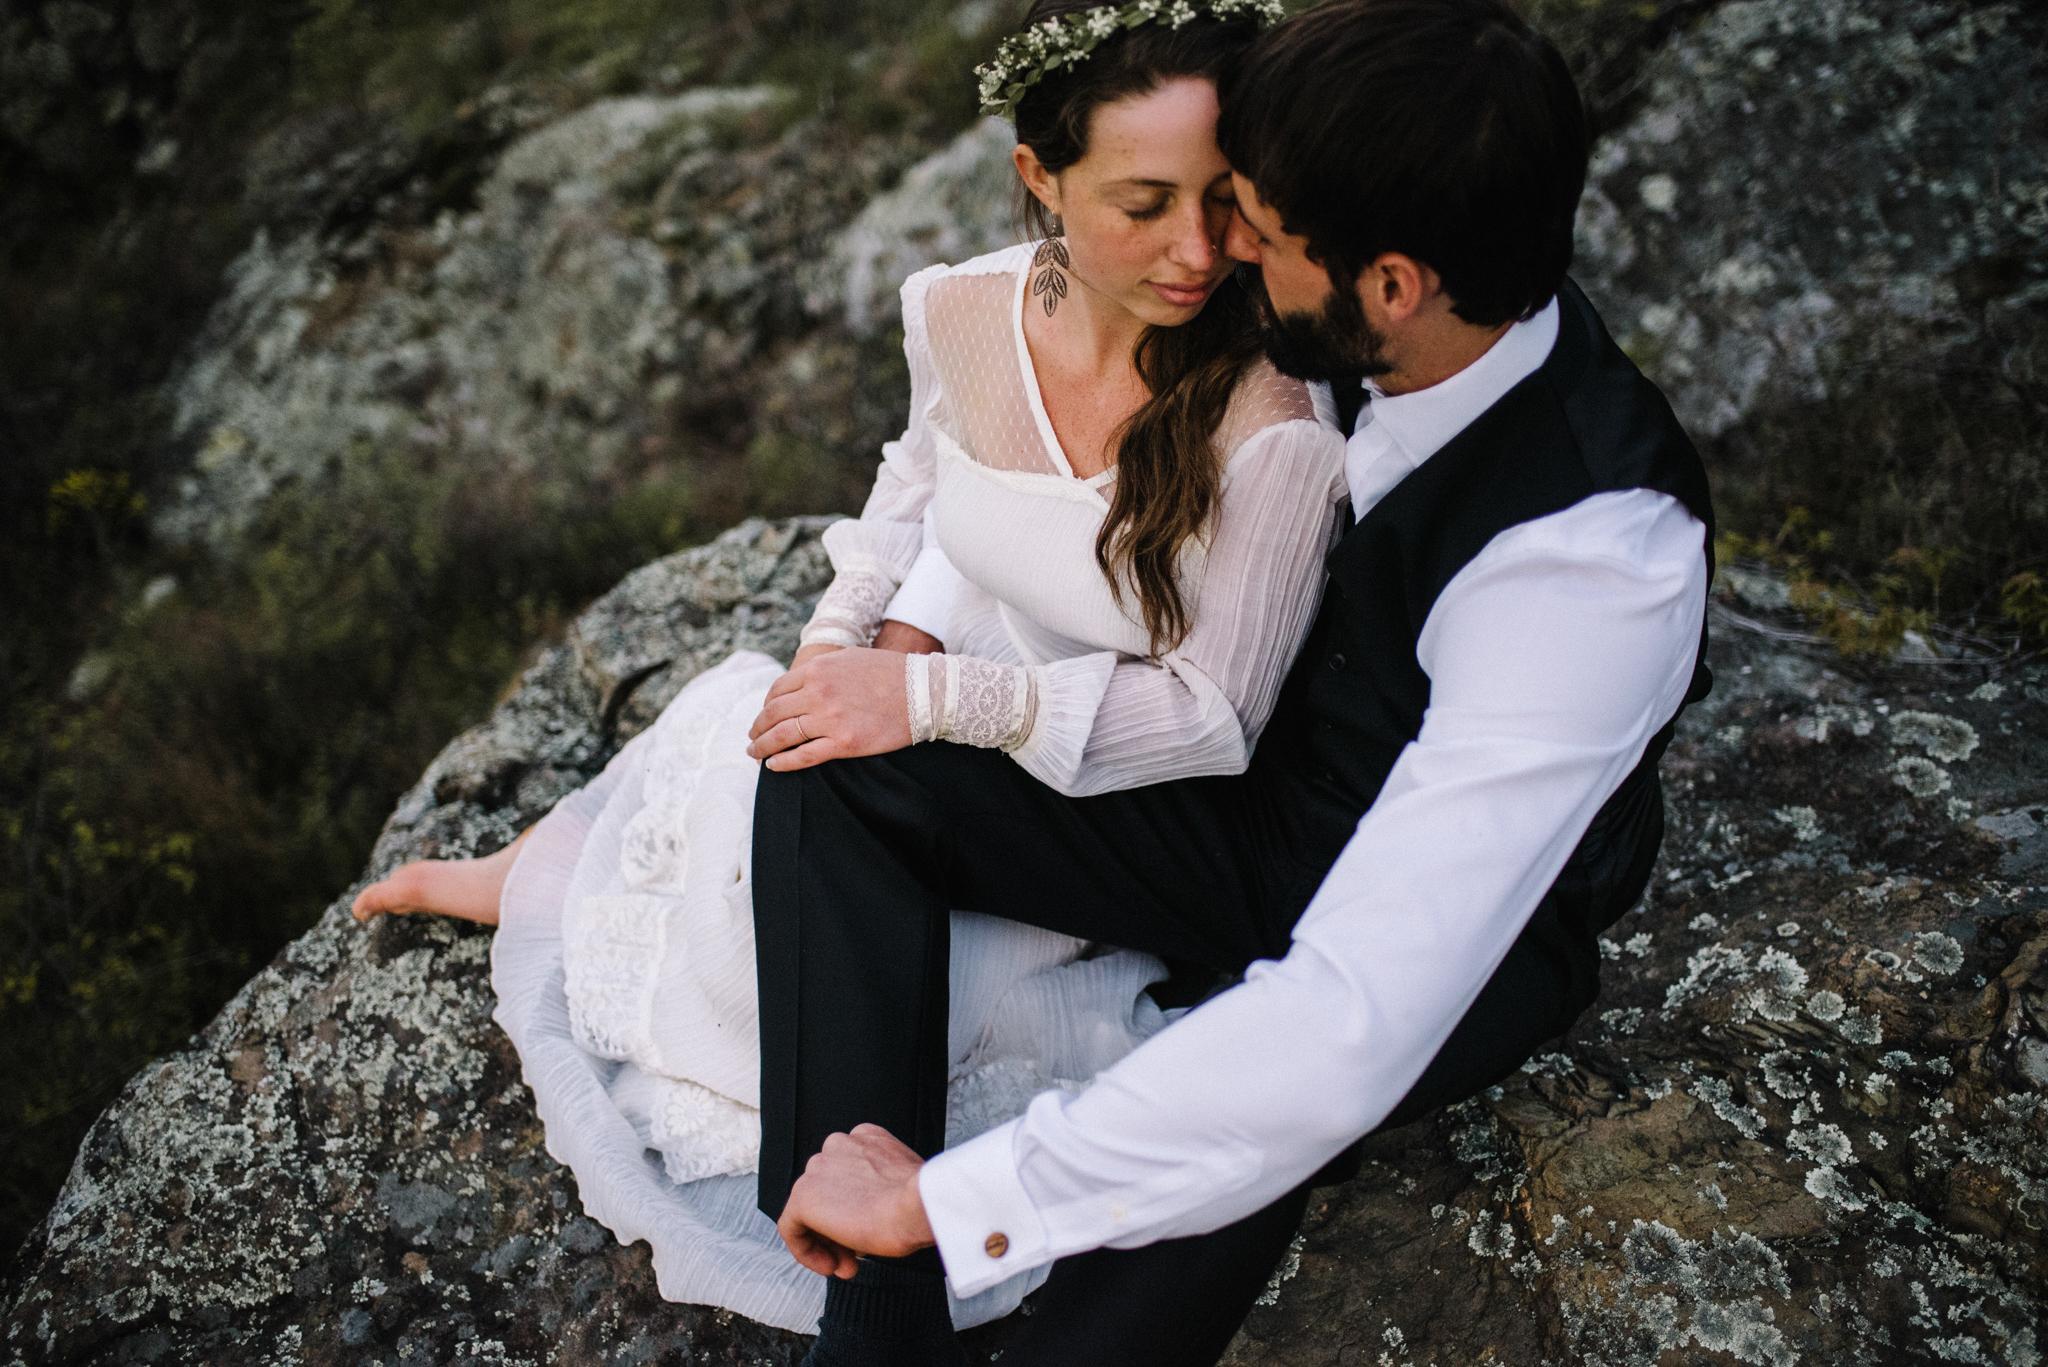 Lisa and Stuart - Post Wedding Couple Portraits - White Sails Creative - Blue Ridge Mountains - Sunrise Shenandoah National Park_33.JPG